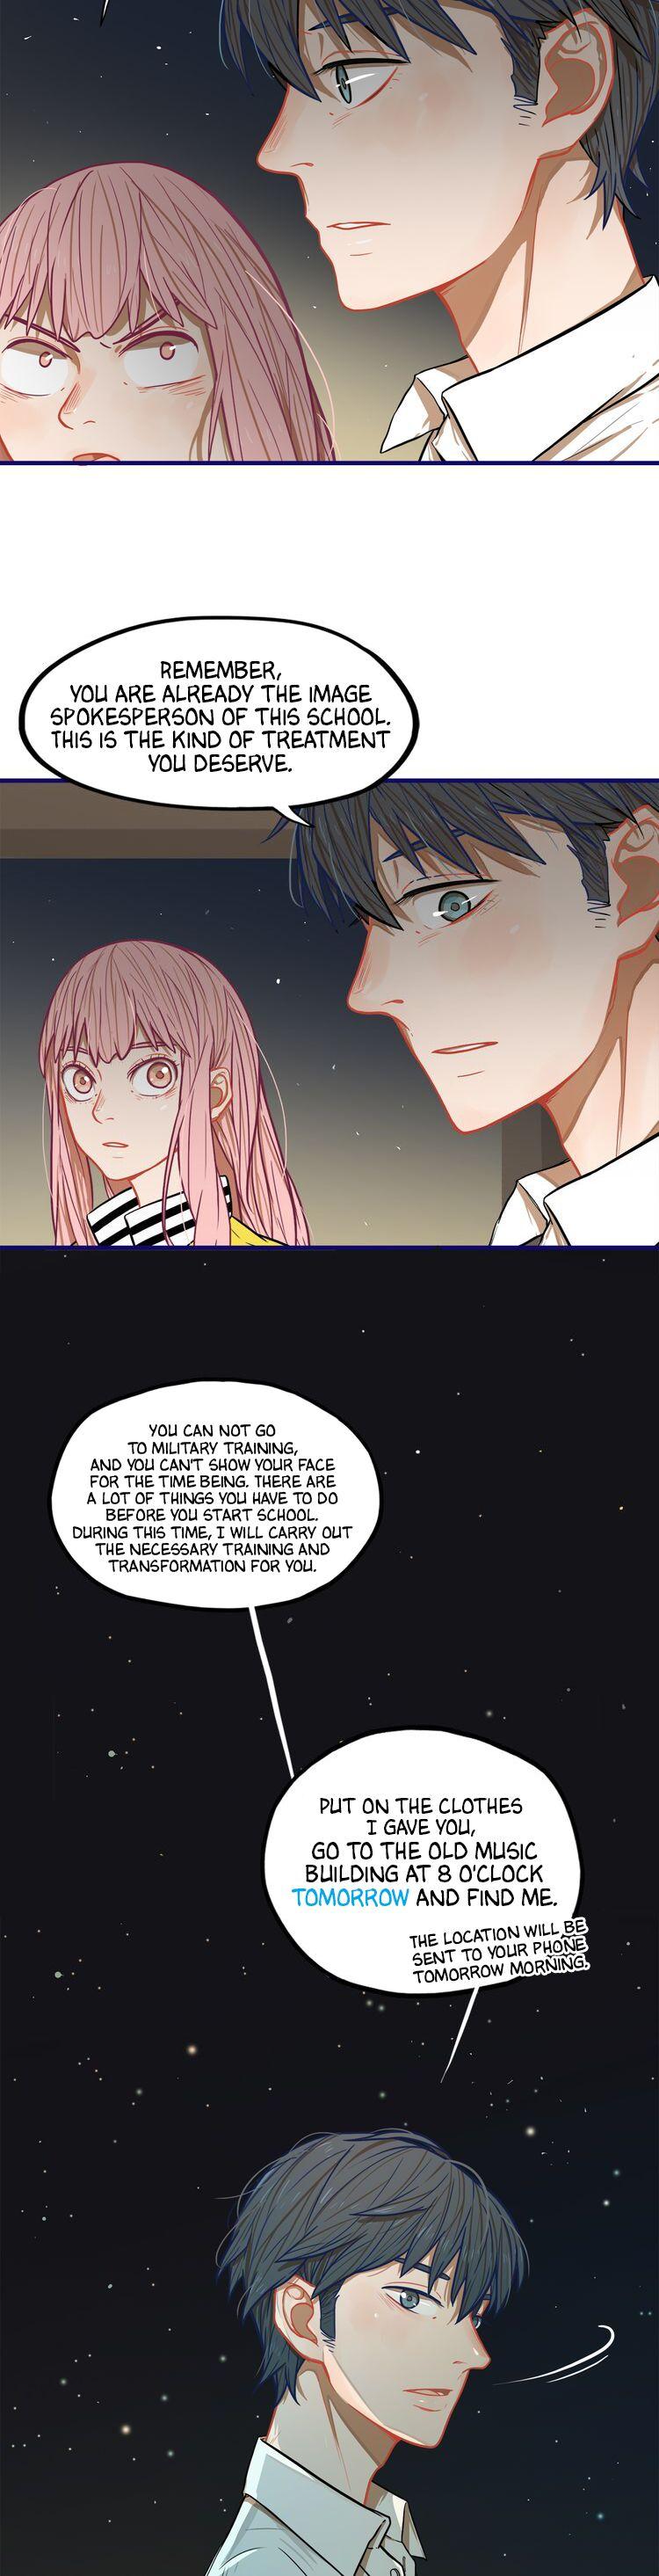 Senpai's Girly Heart 3 Page 2